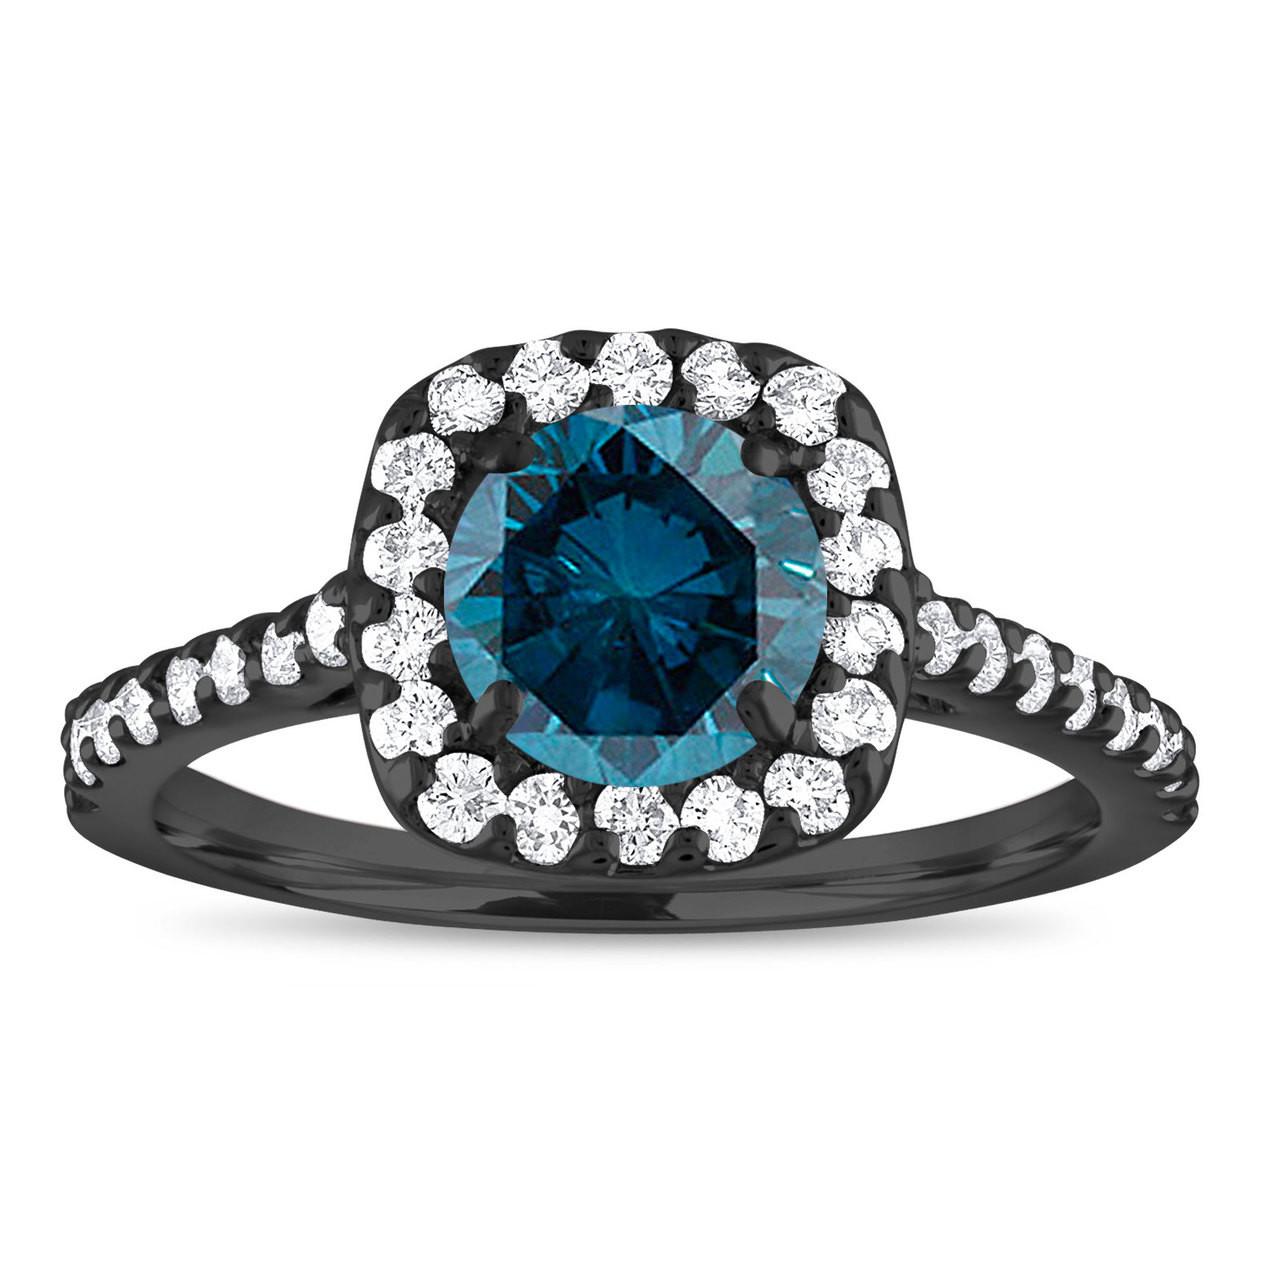 Blue Diamond Engagement Ring Halo Engagement Ring Cushion Cut Vintage Wedding Ring 14k Black Gold 1 58 Carat Unique Certified Handmade